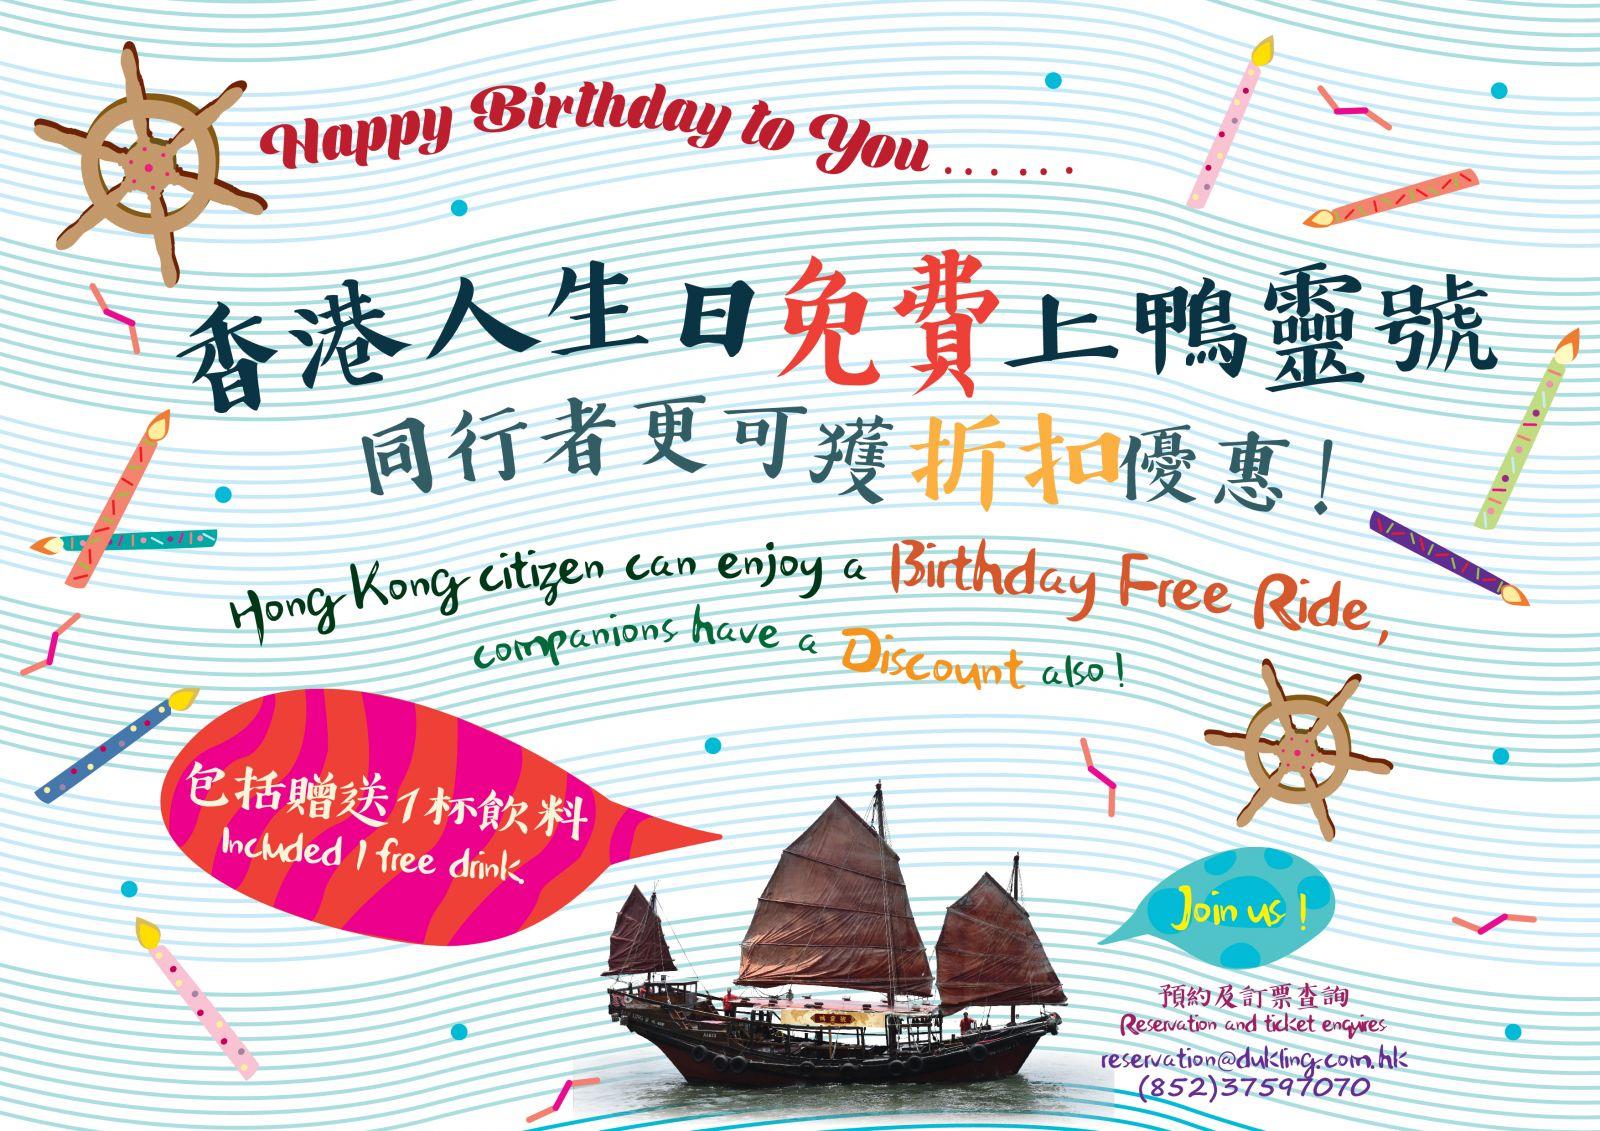 81c6976f43b Birthday Offer - Dukling